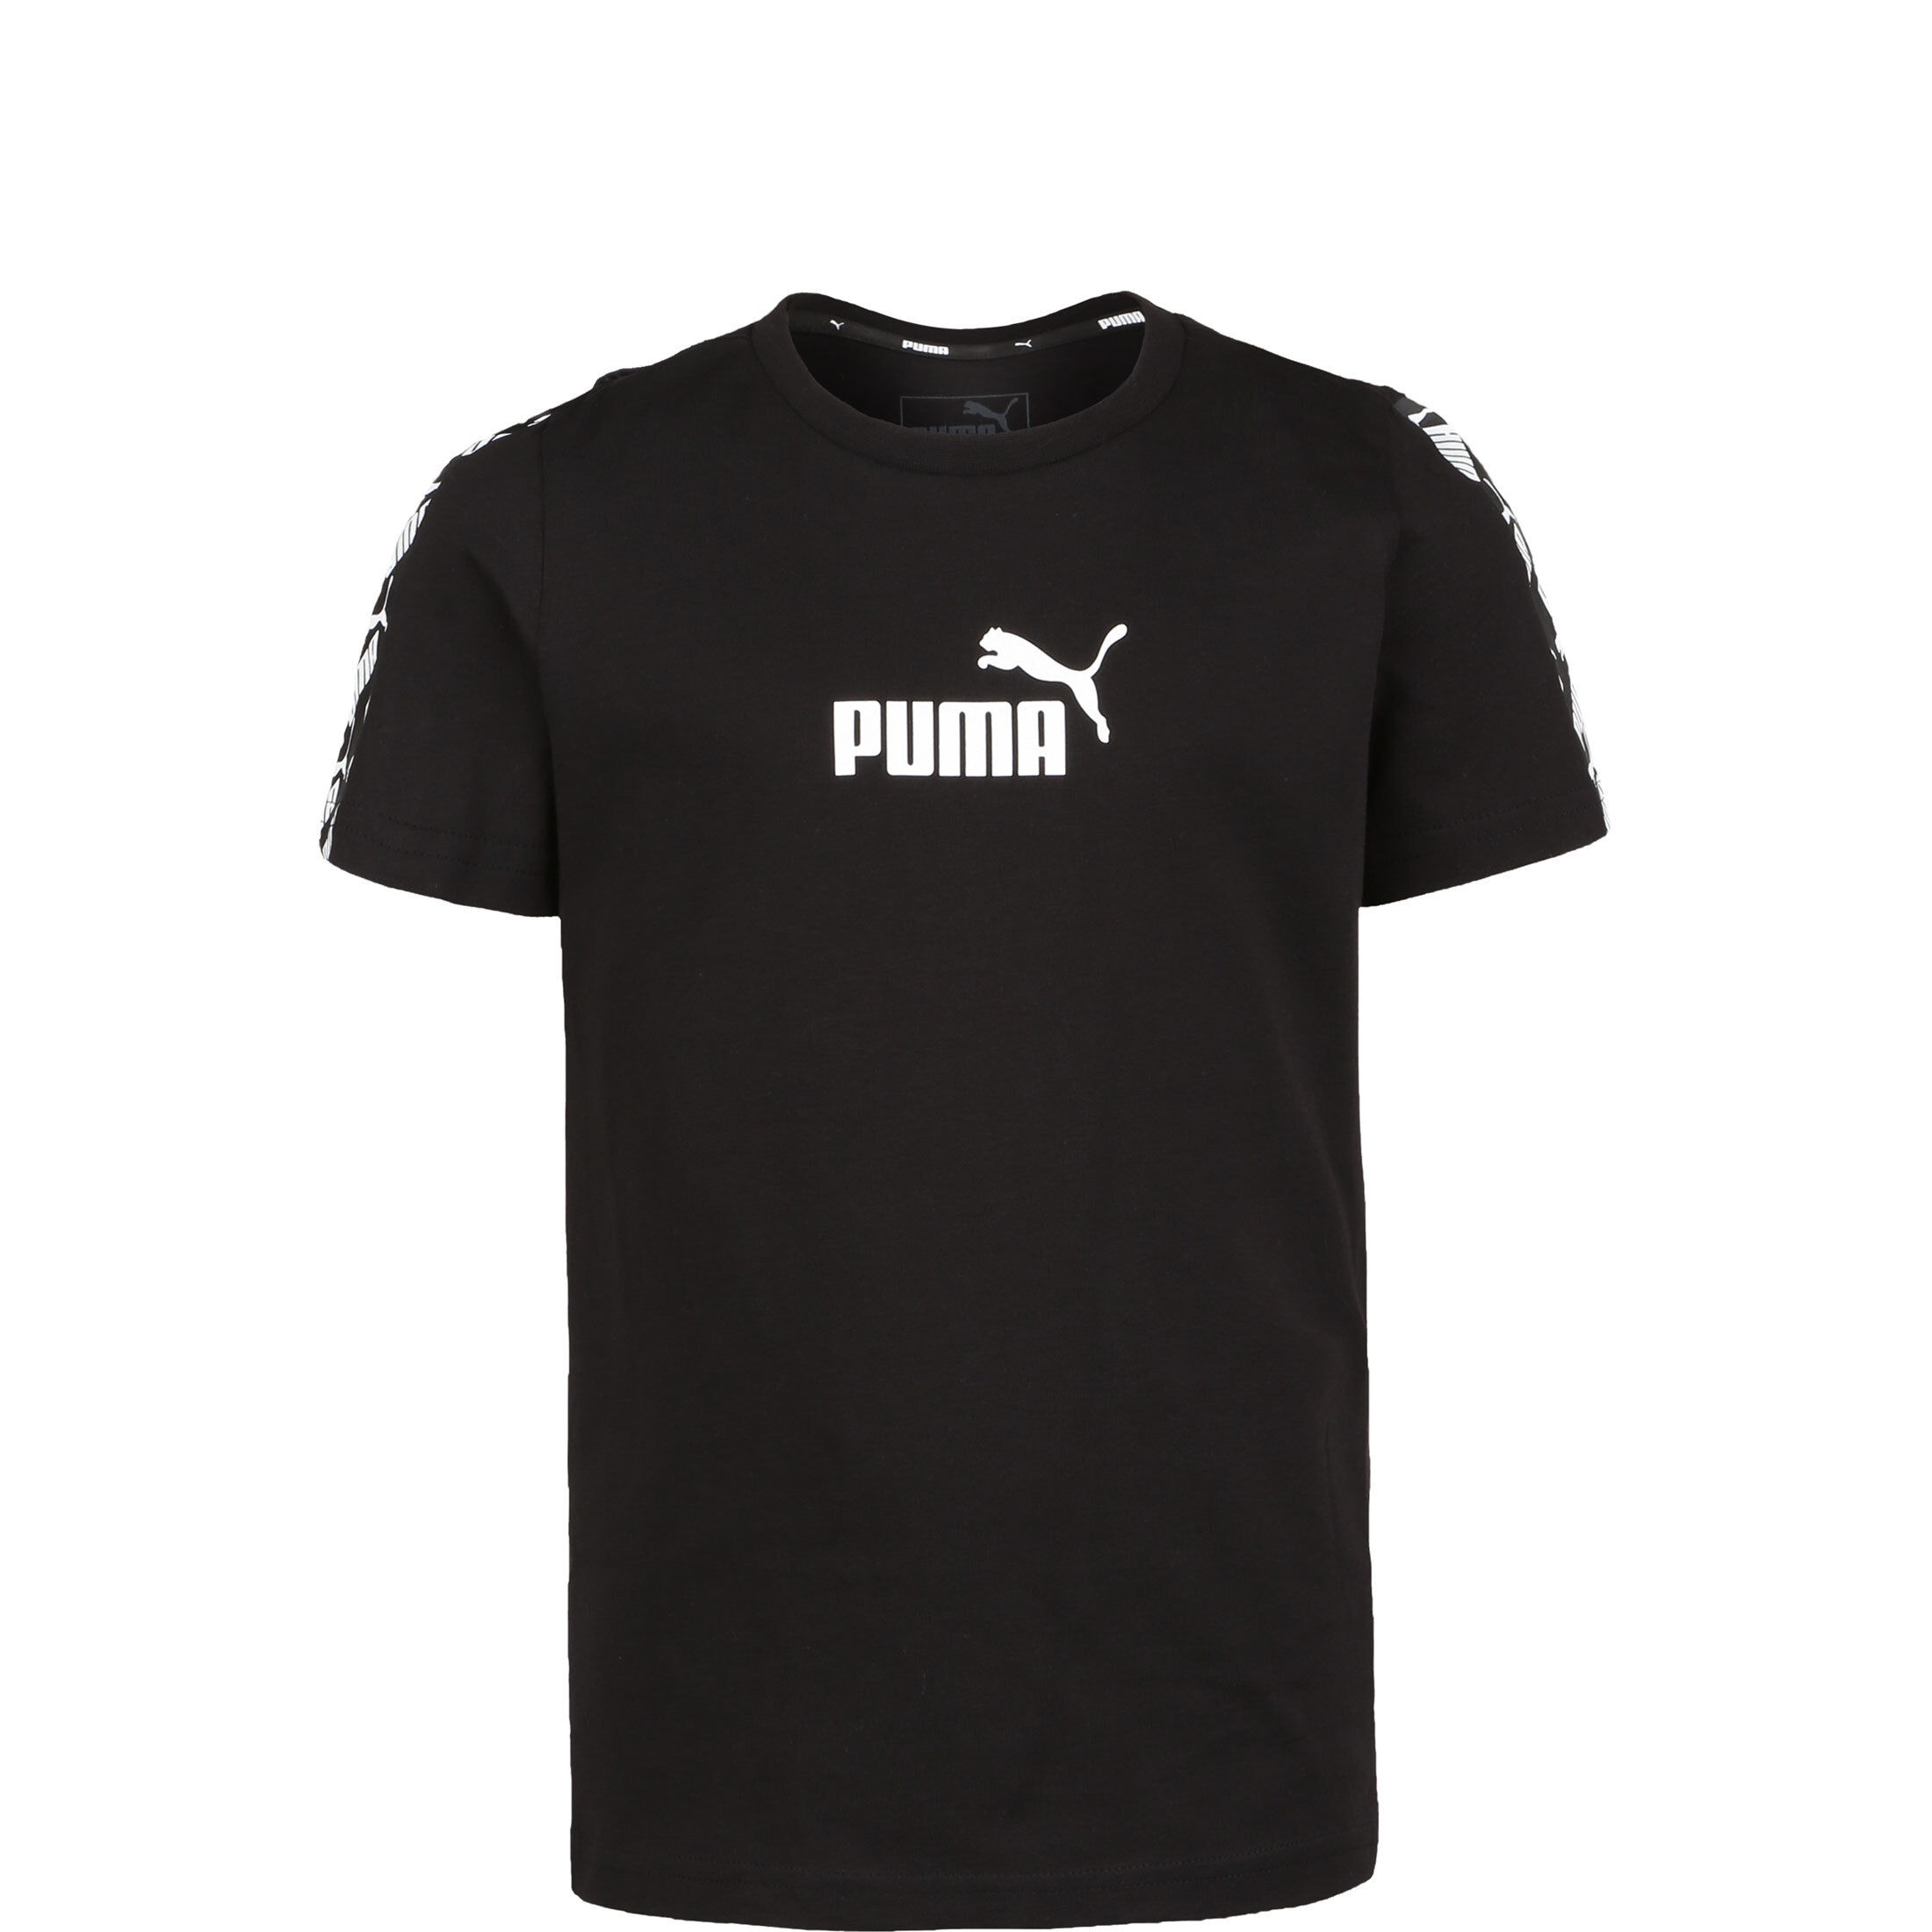 Trainingsbekleidung Puma   bei OUTFITTER